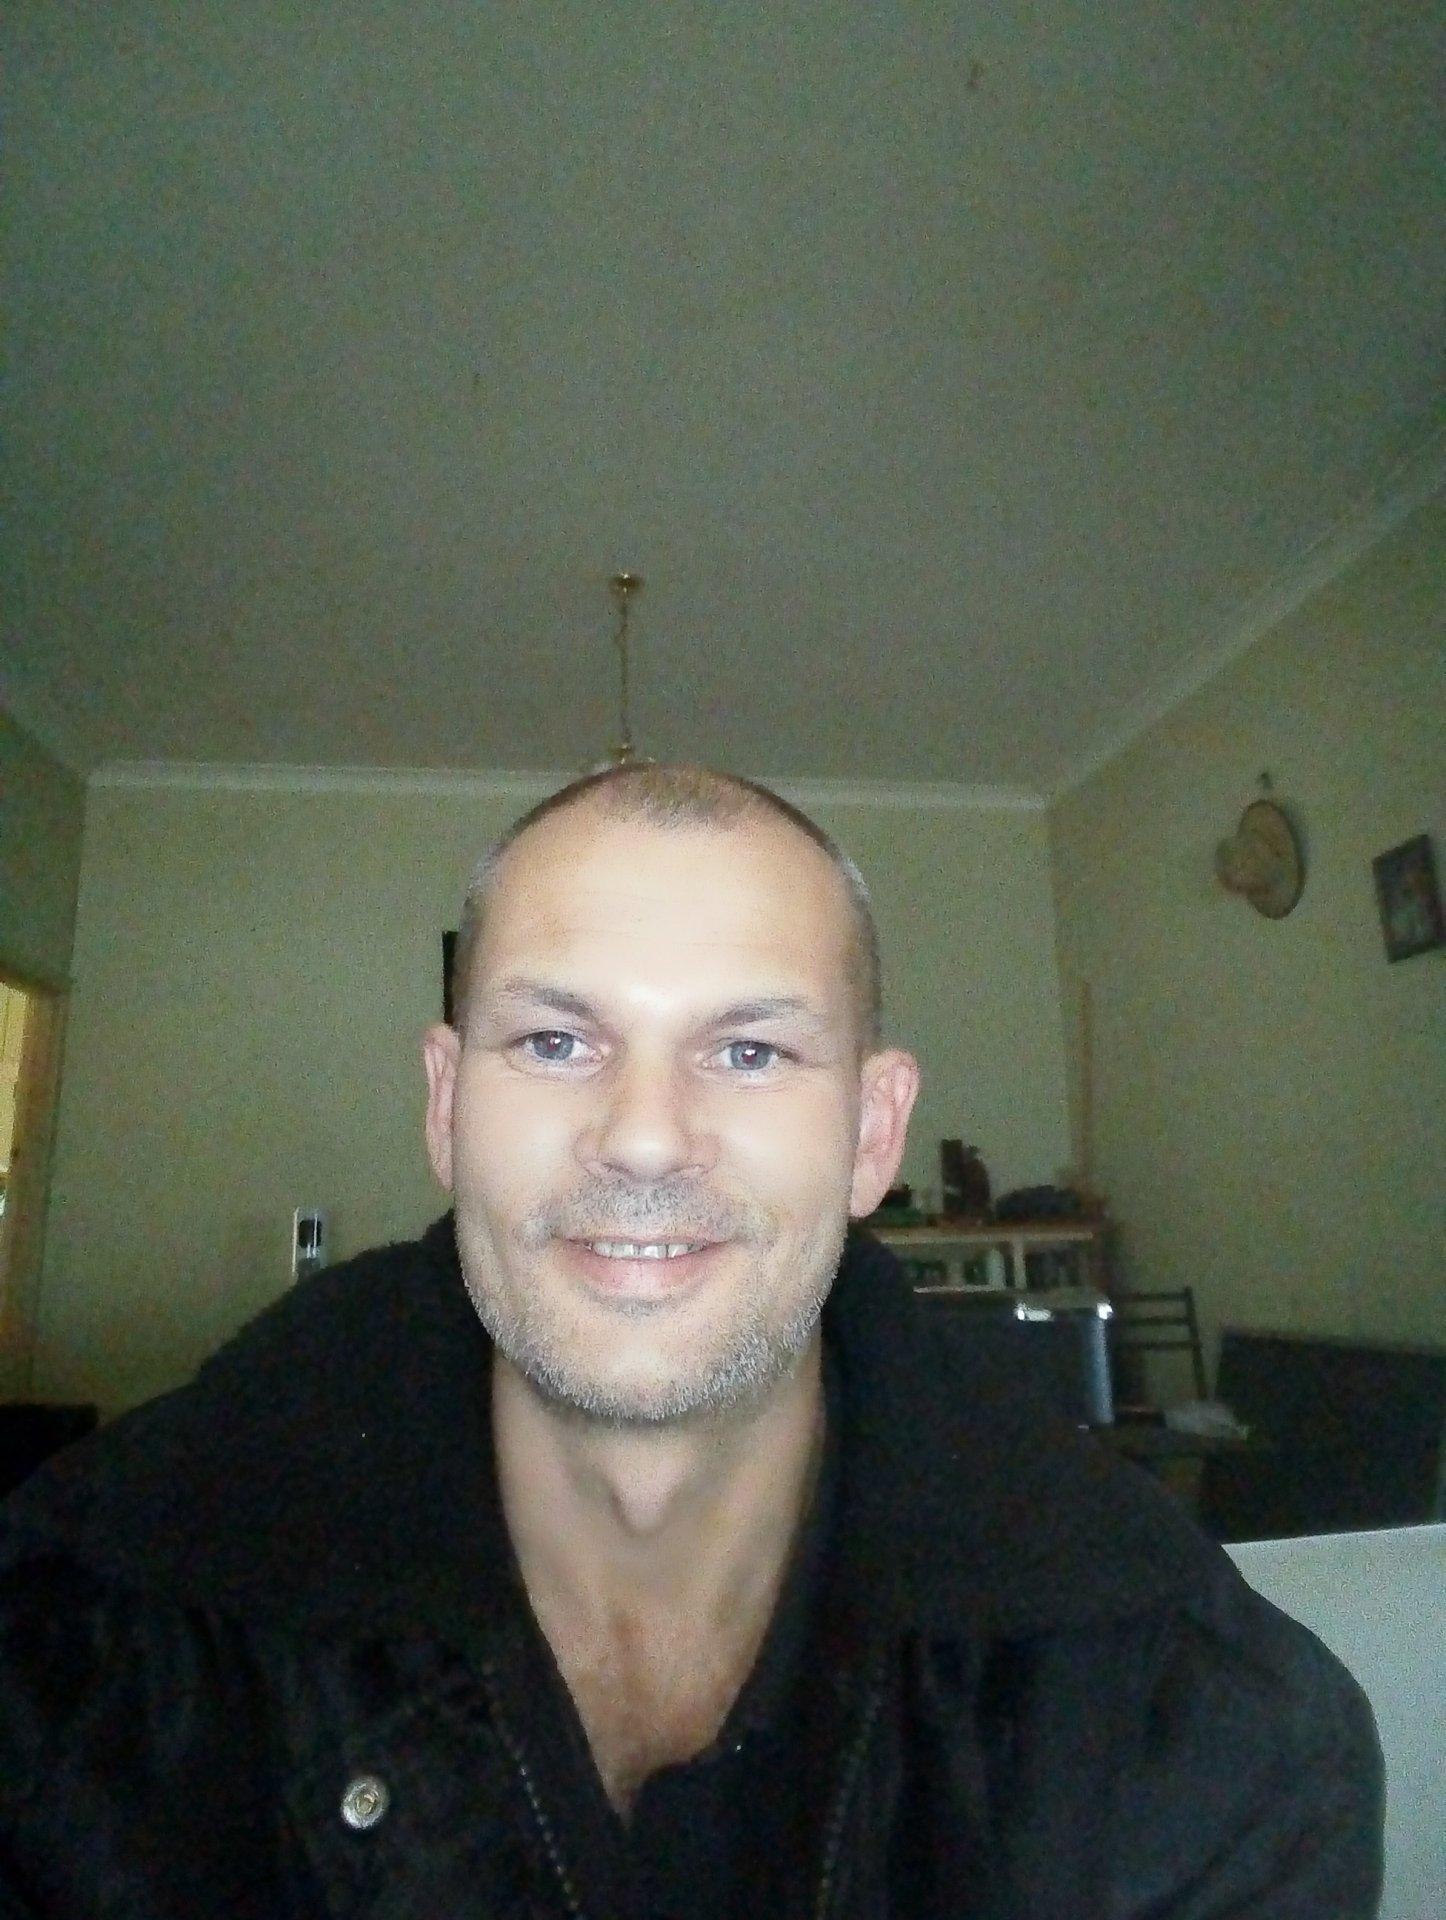 DanielLameroo from South Australia,Australia